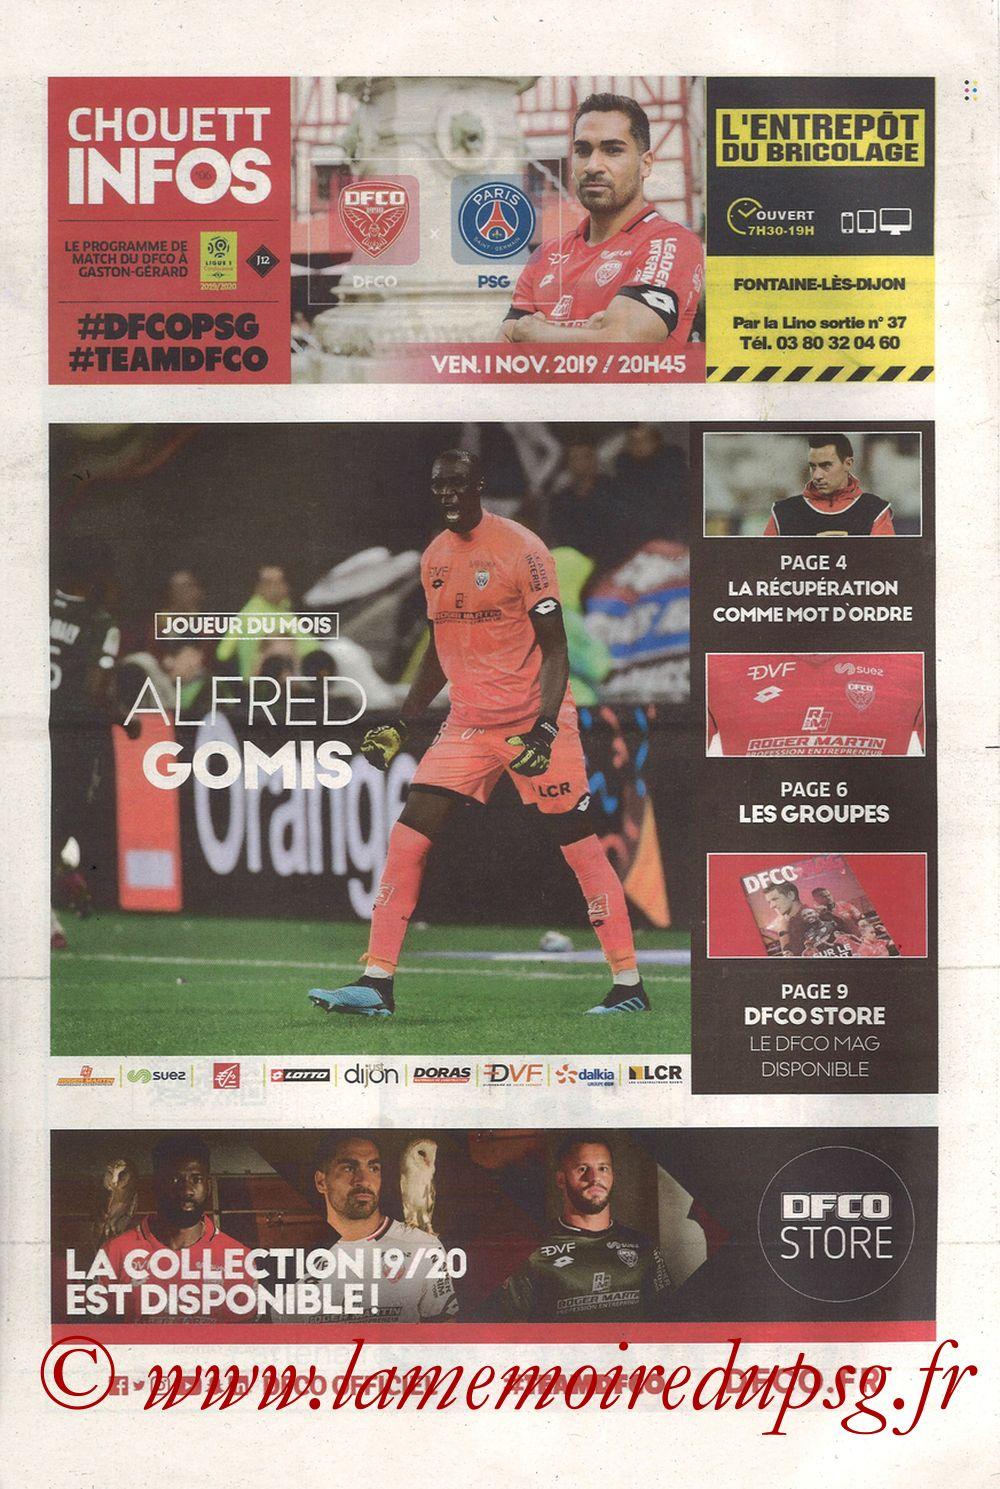 2019-11-01  Dijon-PSG (12ème L1, Chouett Infos)